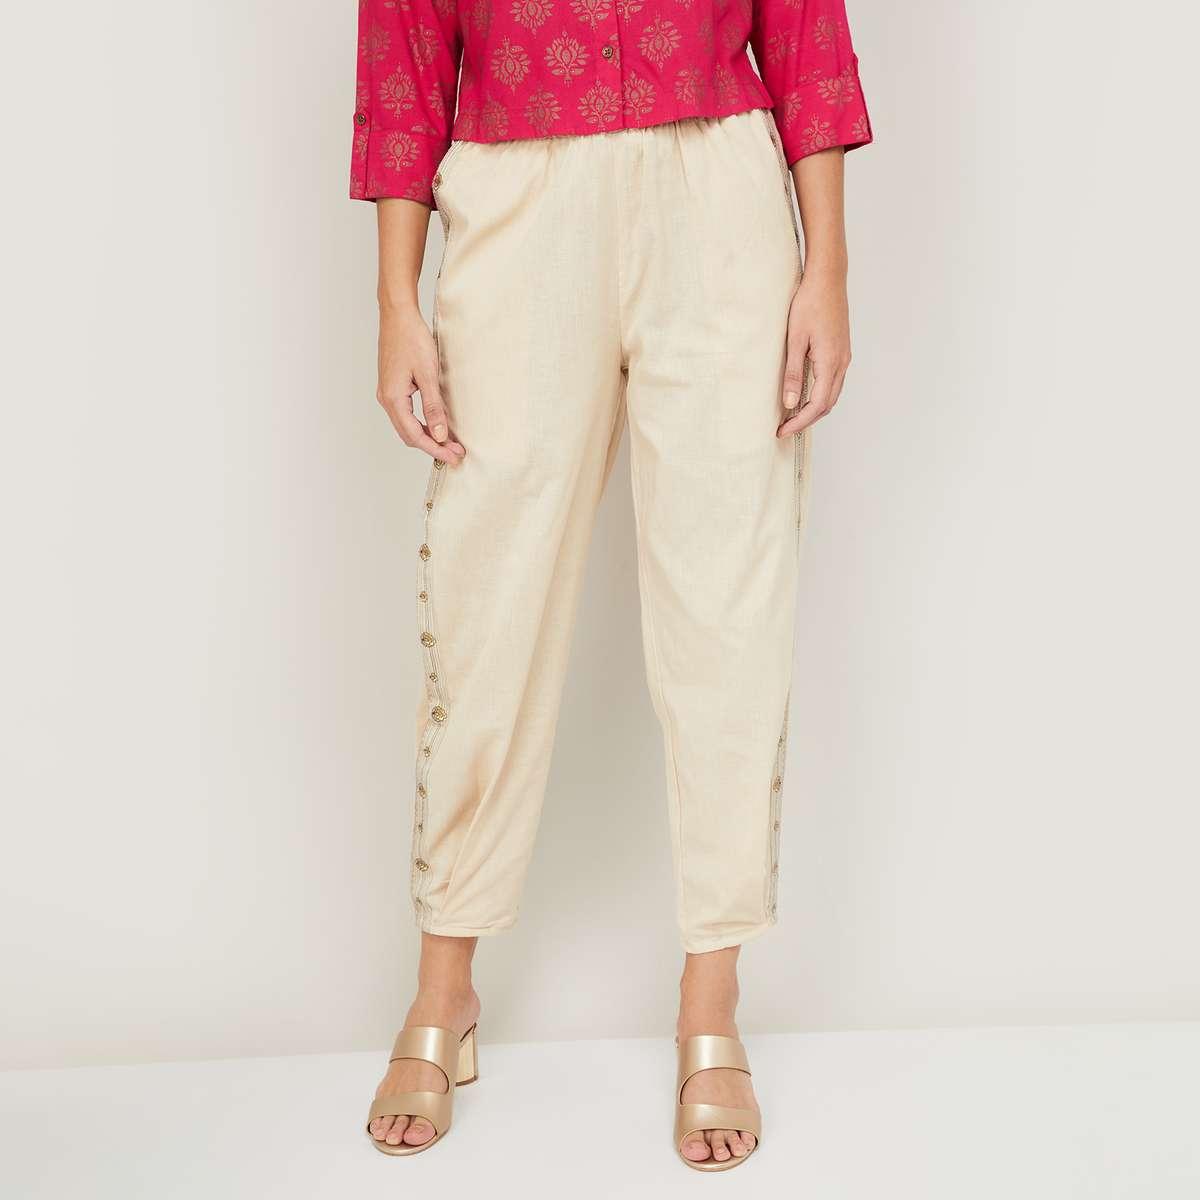 2.MELANGE Women Embroidered Straight Pants